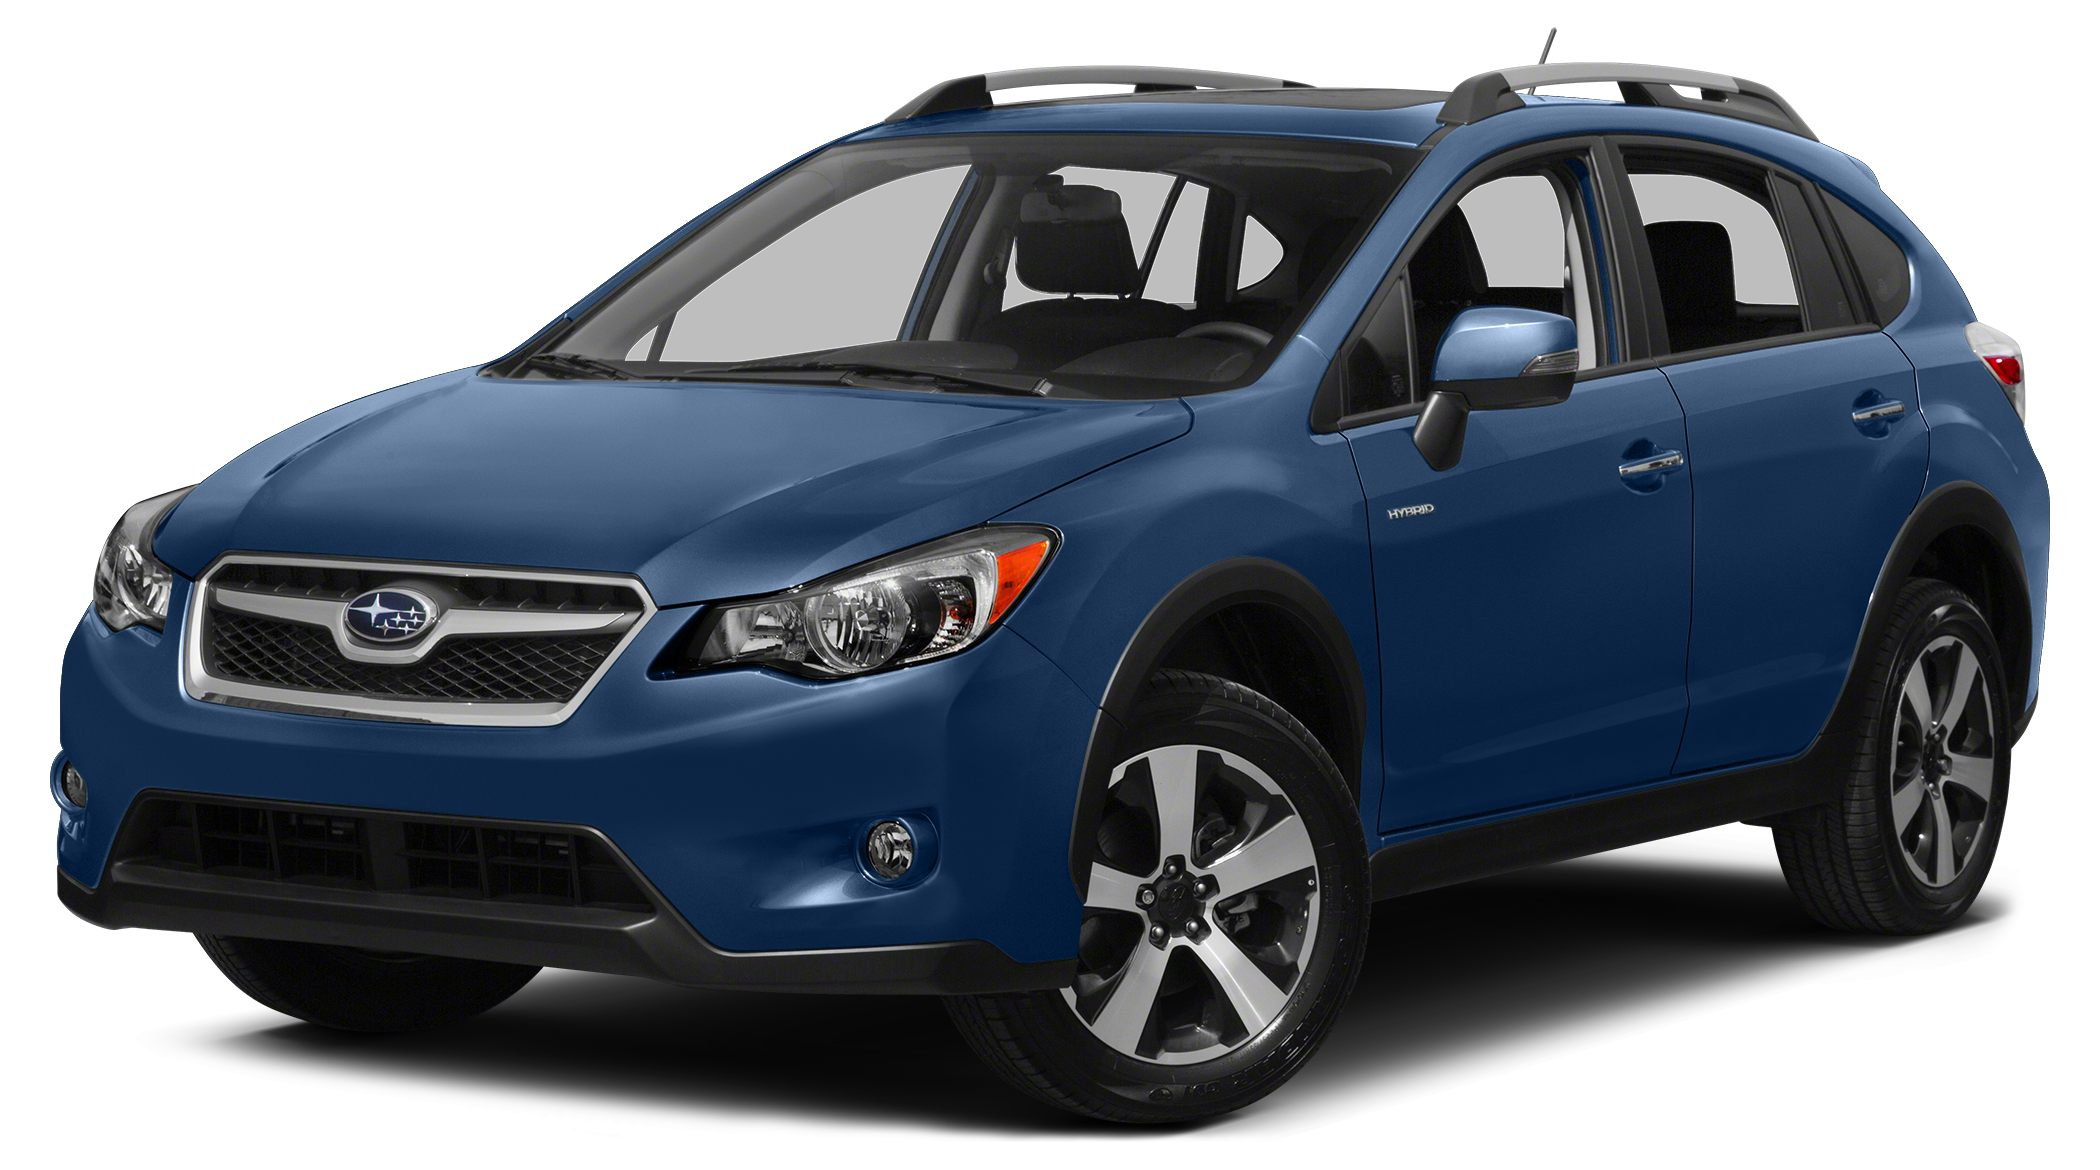 2014 Subaru XV Crosstrek Hybrid 20i Touring Recent Arrival Priced below KBB Fair Purchase Price